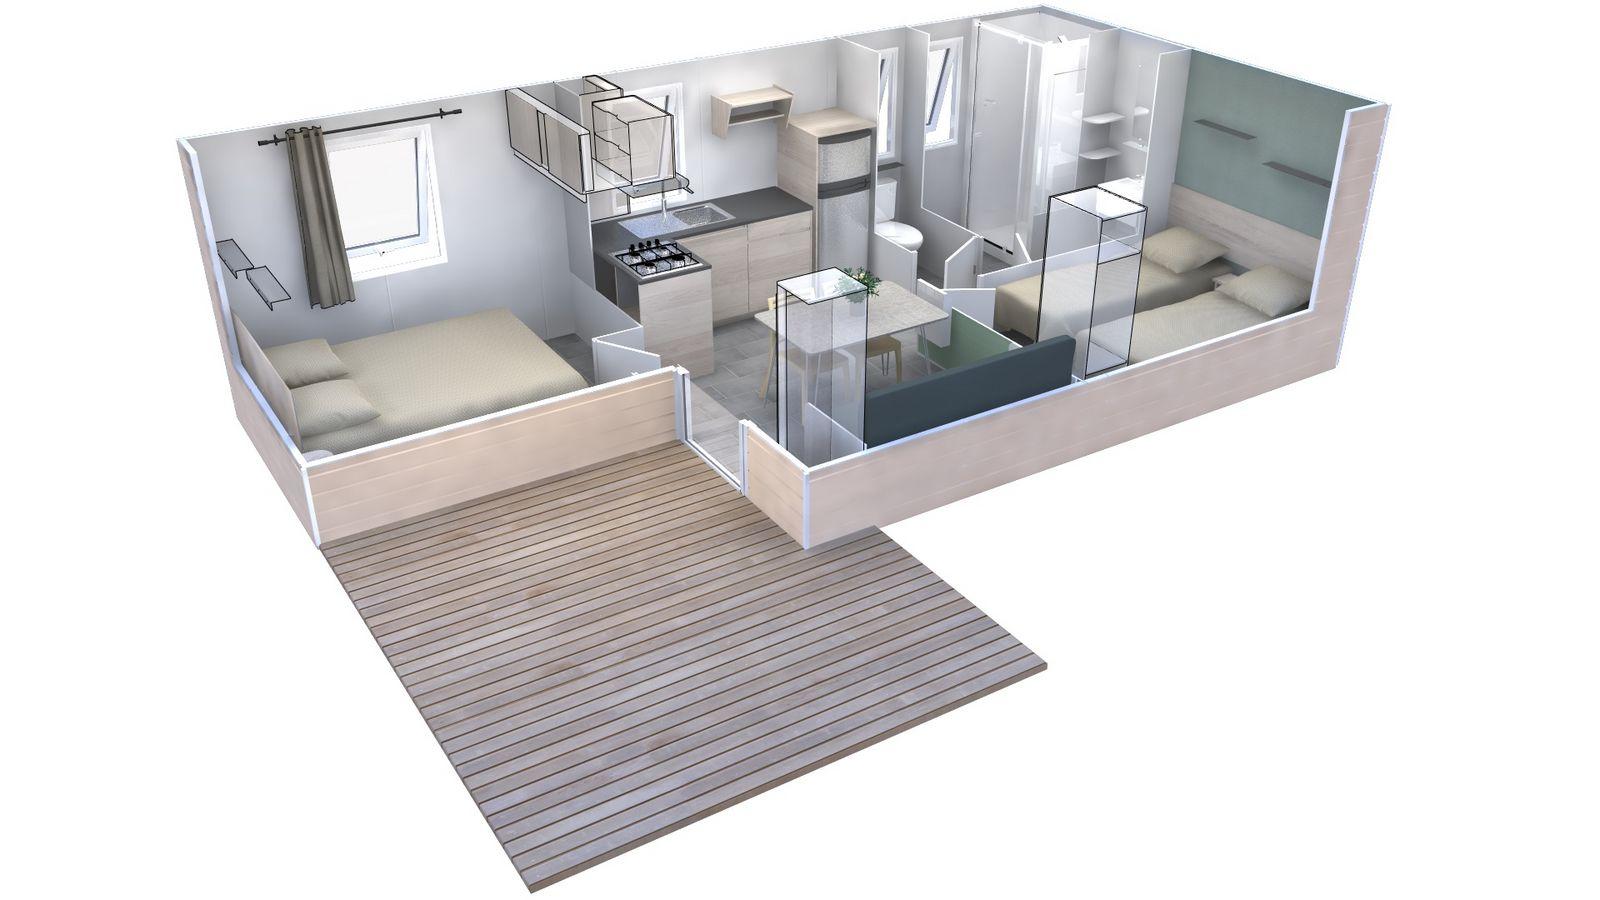 residences-trigano-mobil-home-2chambres-evolution29ti-plan-3D